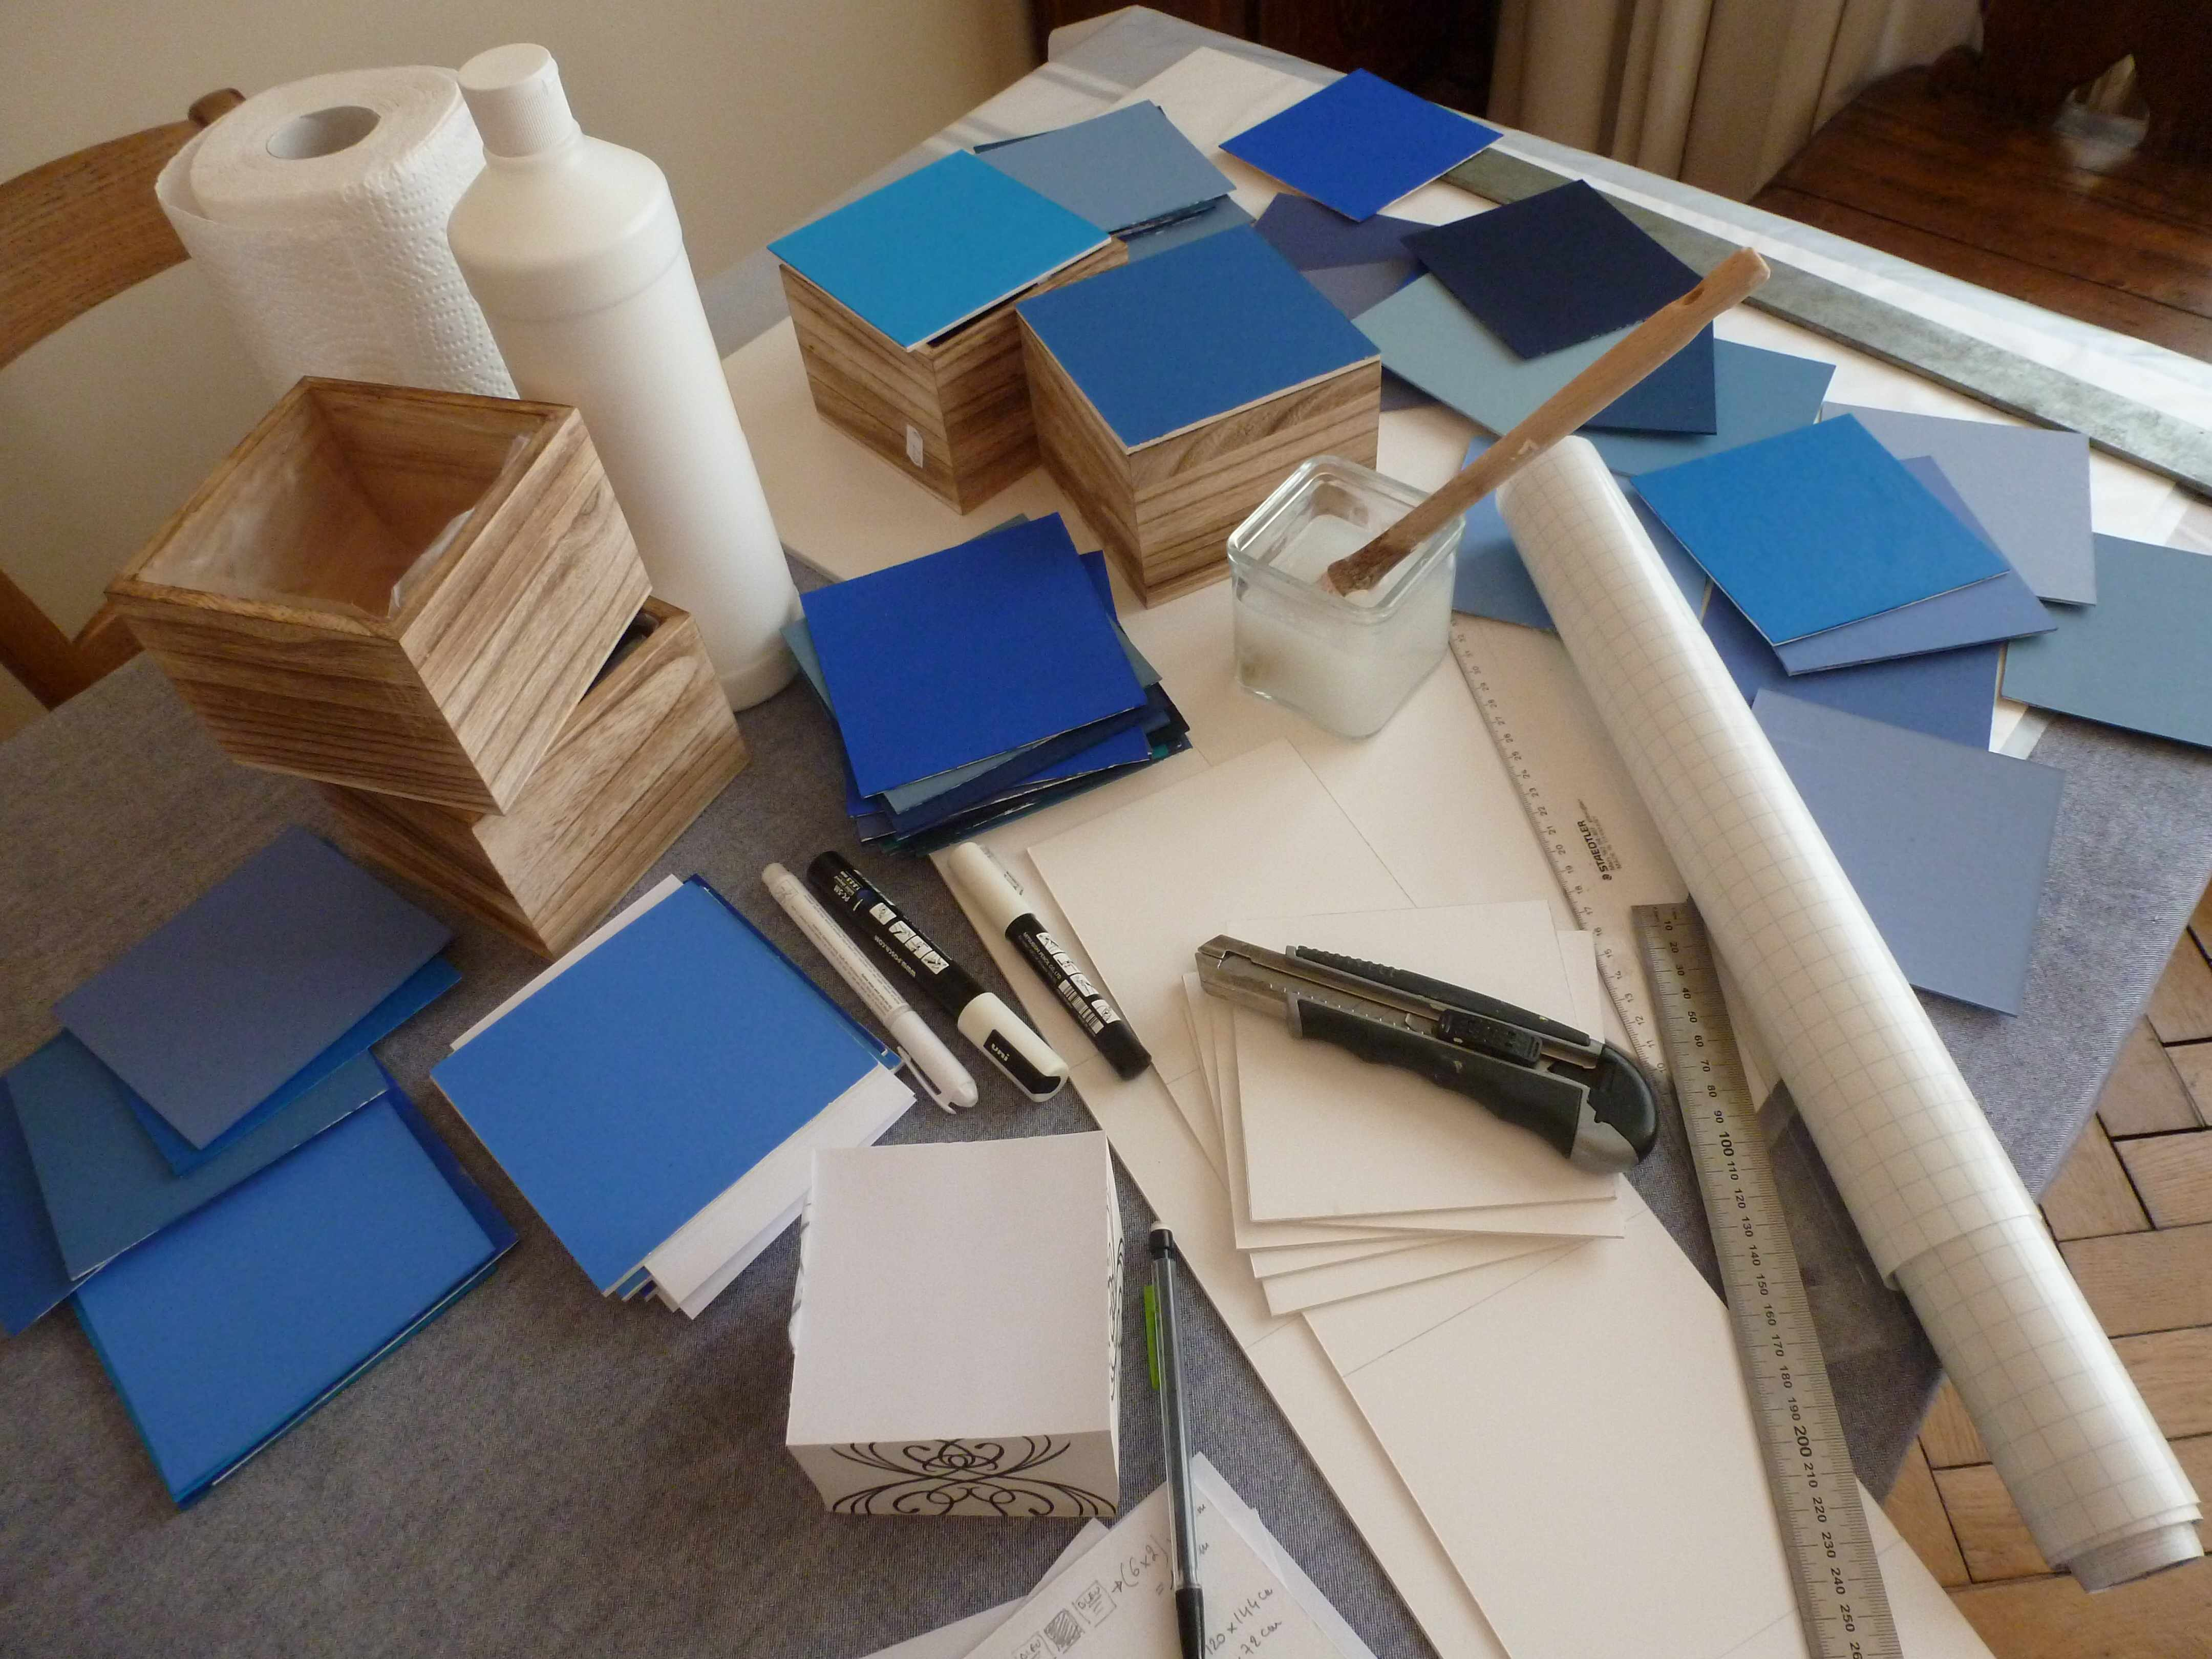 A-W couvercles boites carres bleus marque-table